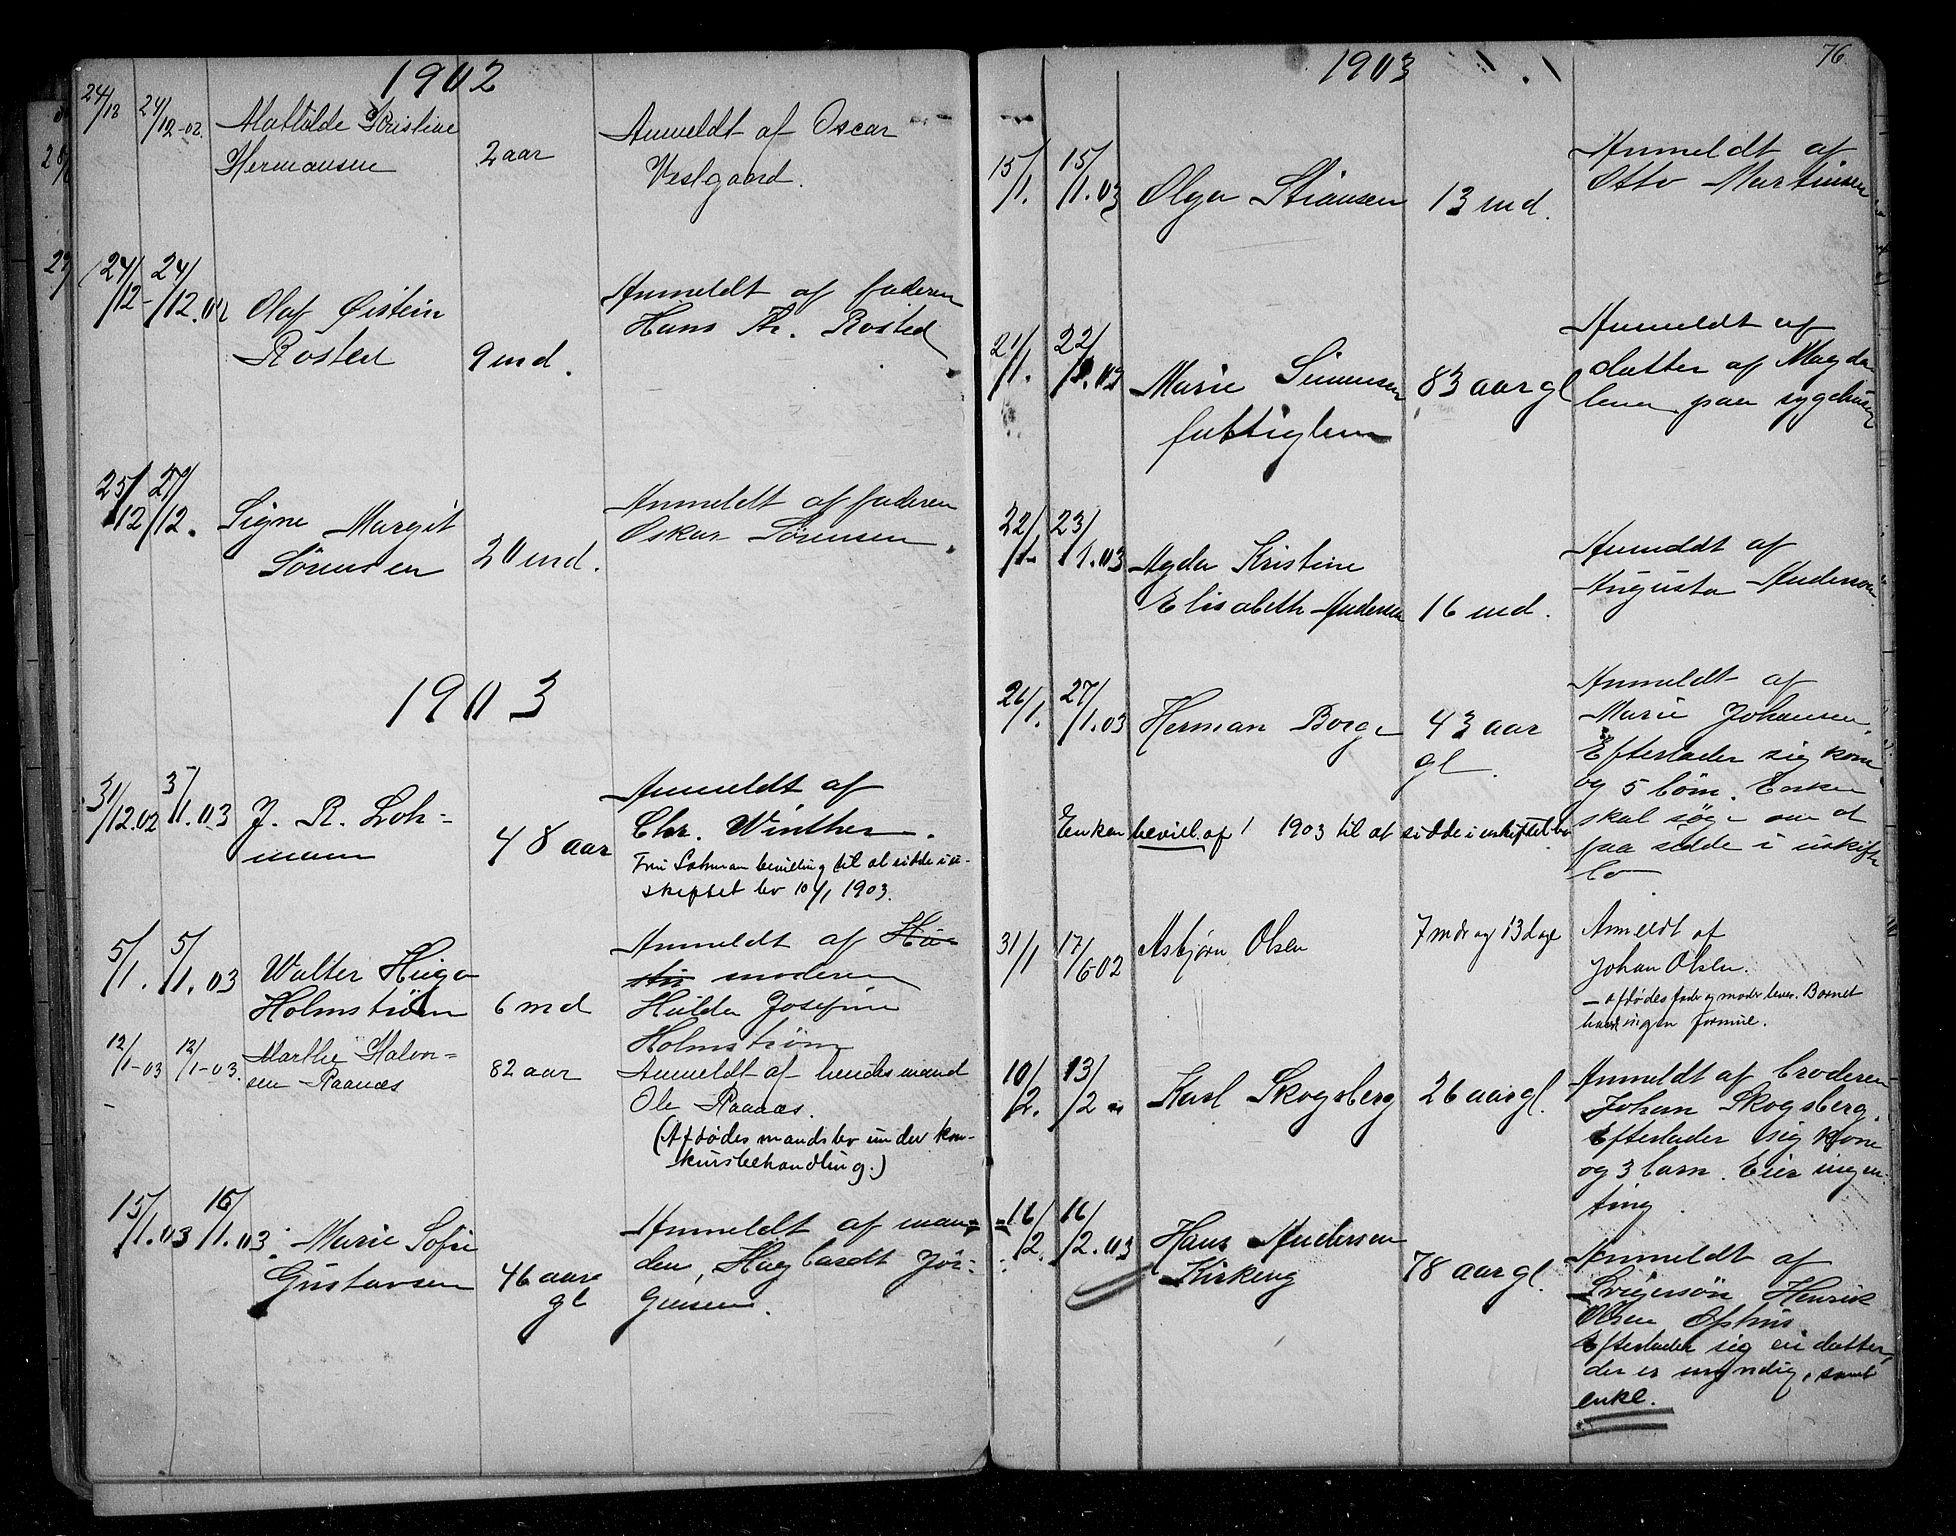 SAO, Sarpsborg byfogd, H/Ha/Haa/L0001: Dødsfallsprotokoll, 1880-1904, s. 75b-76a